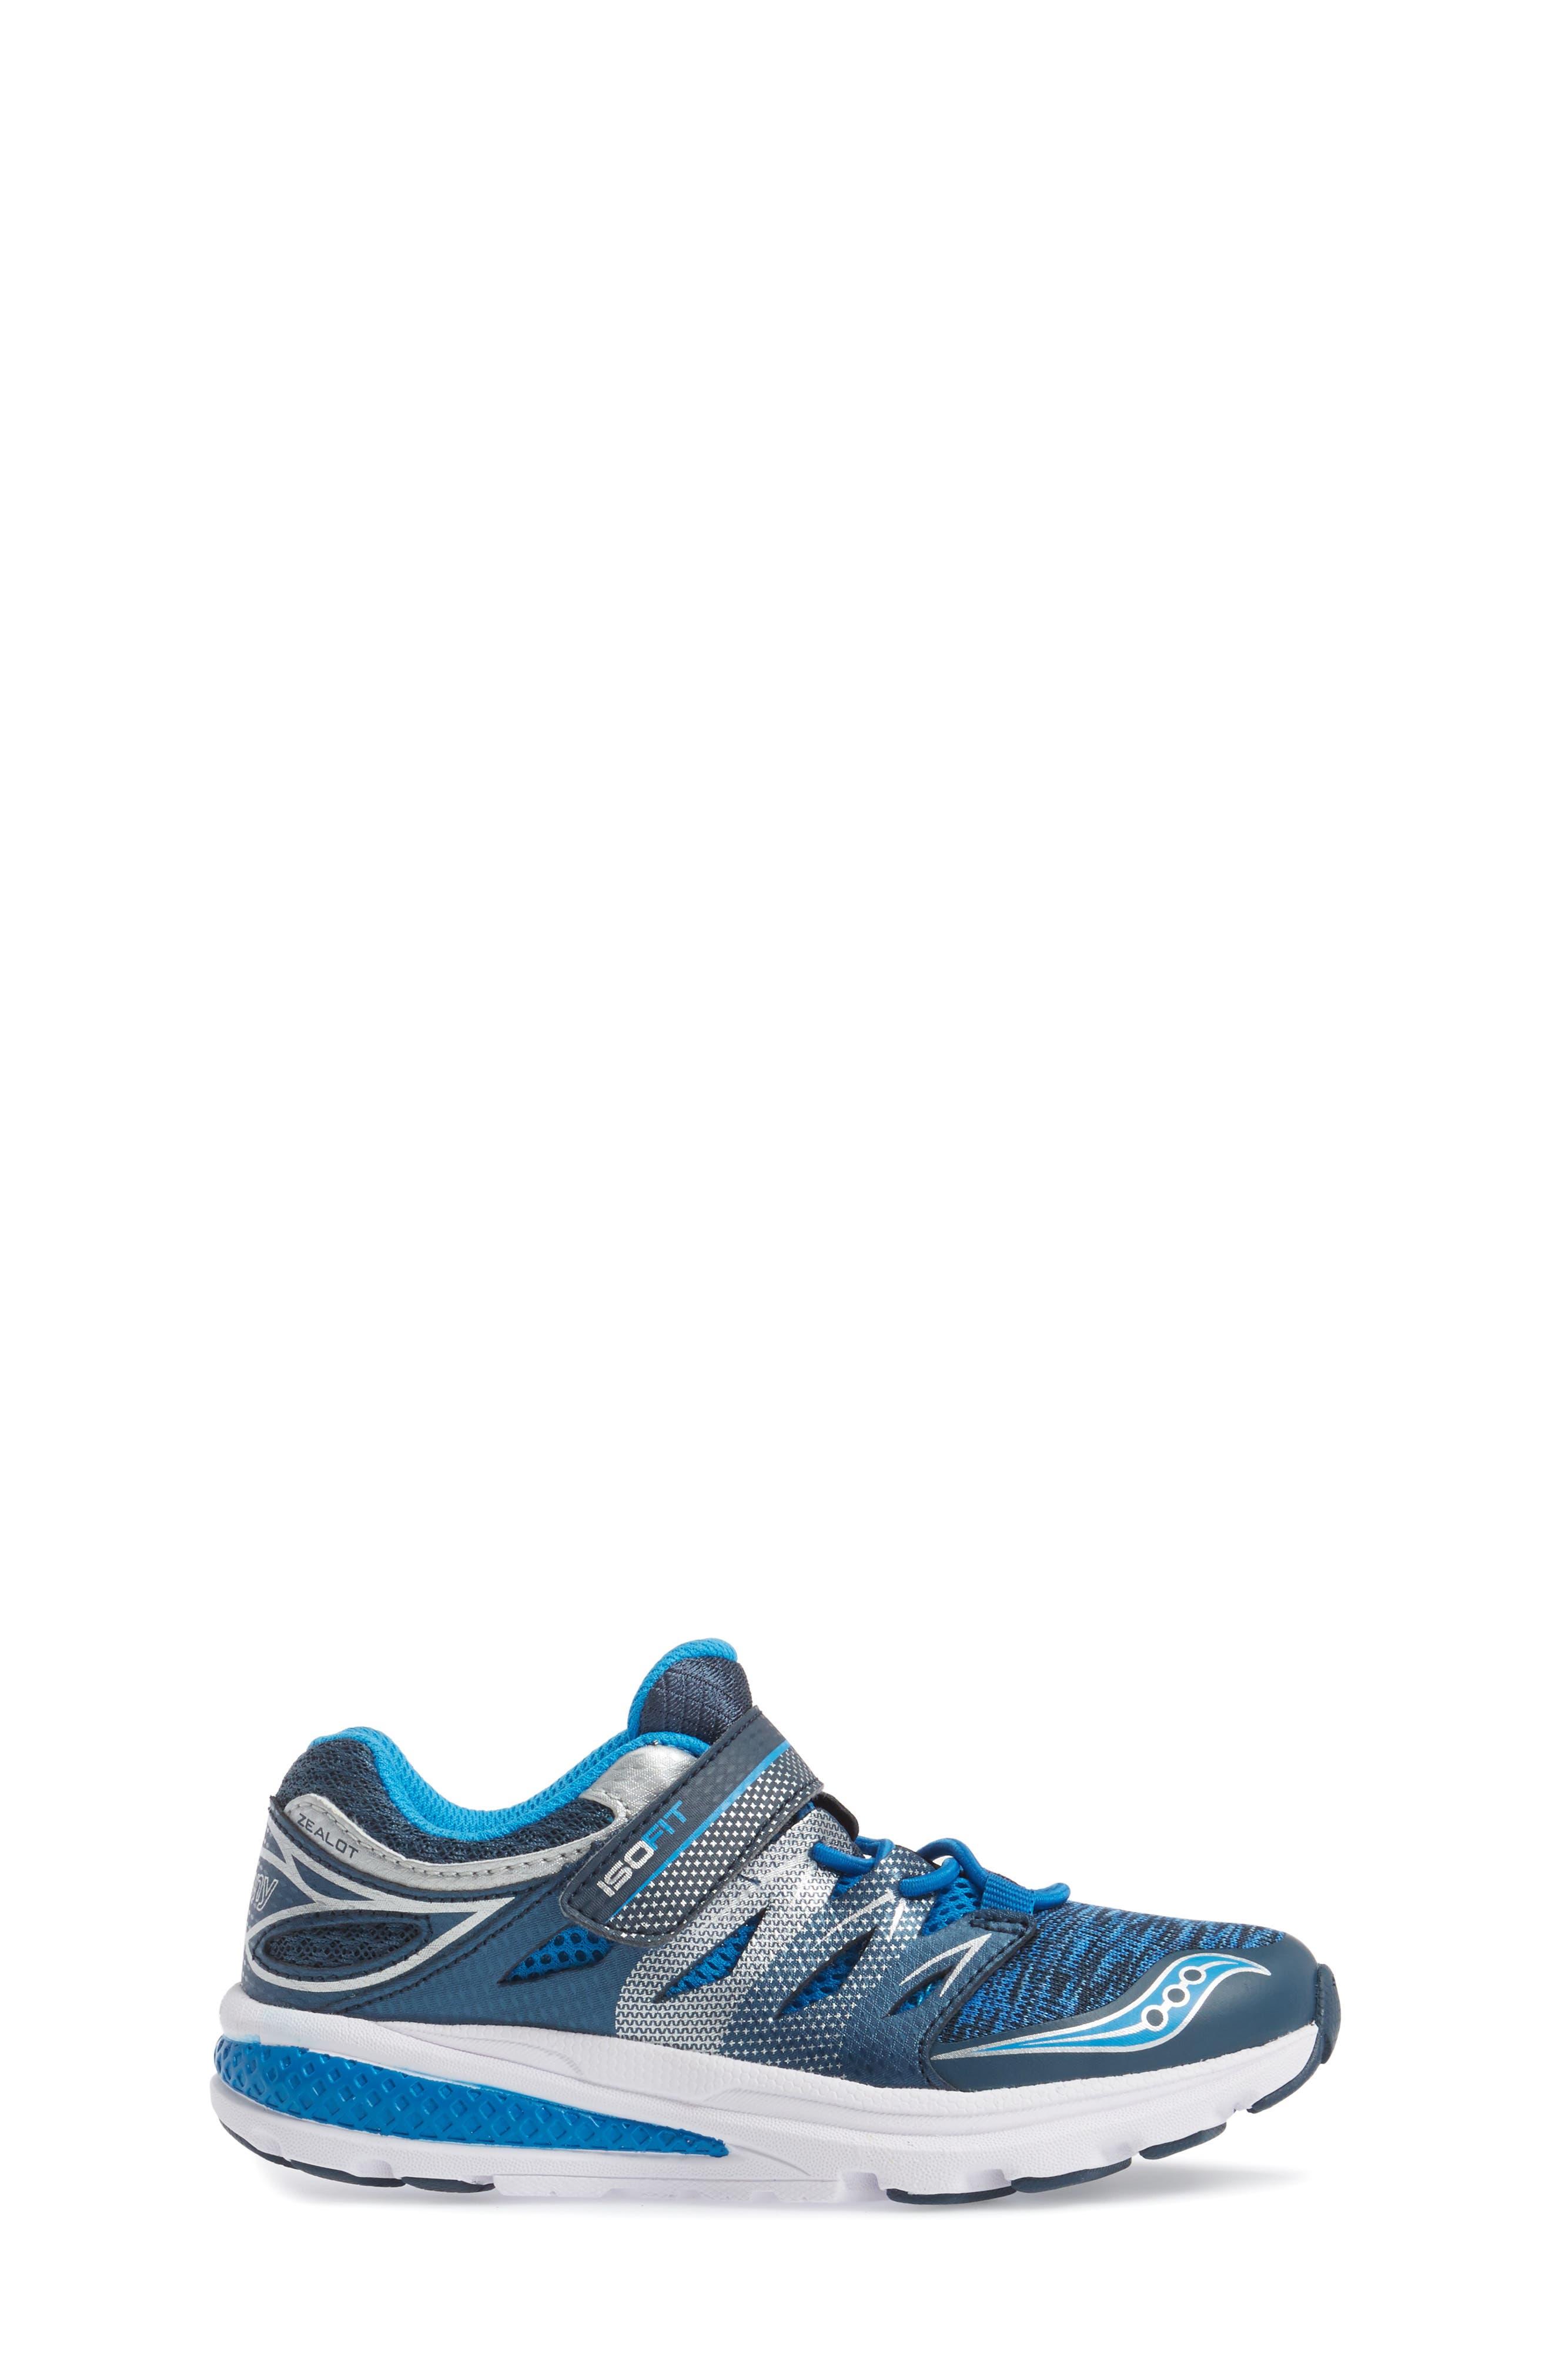 Zealot 2 A/C Sneaker,                             Alternate thumbnail 3, color,                             Royal/ Navy